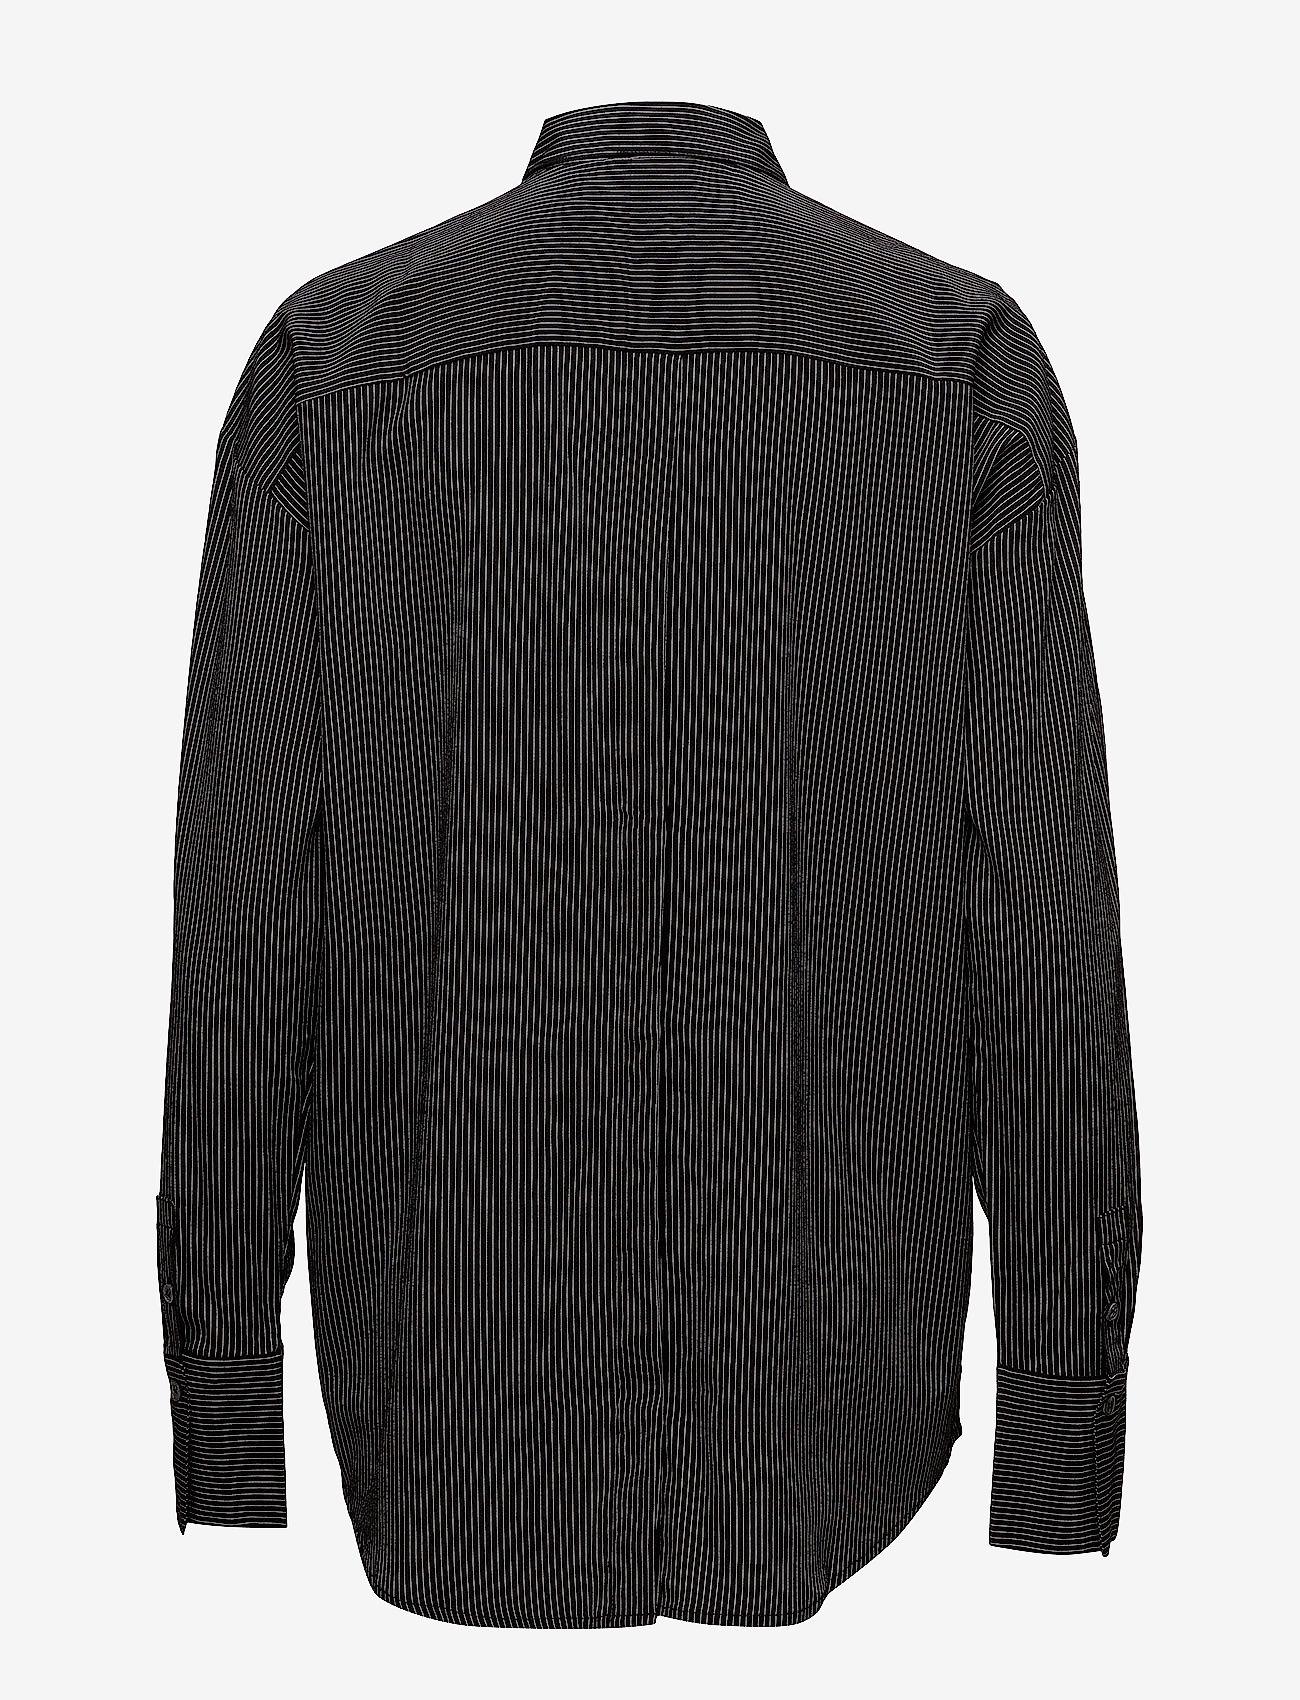 J. Lindeberg Nicole Stretch Silk - Blouses & Shirts BLACK